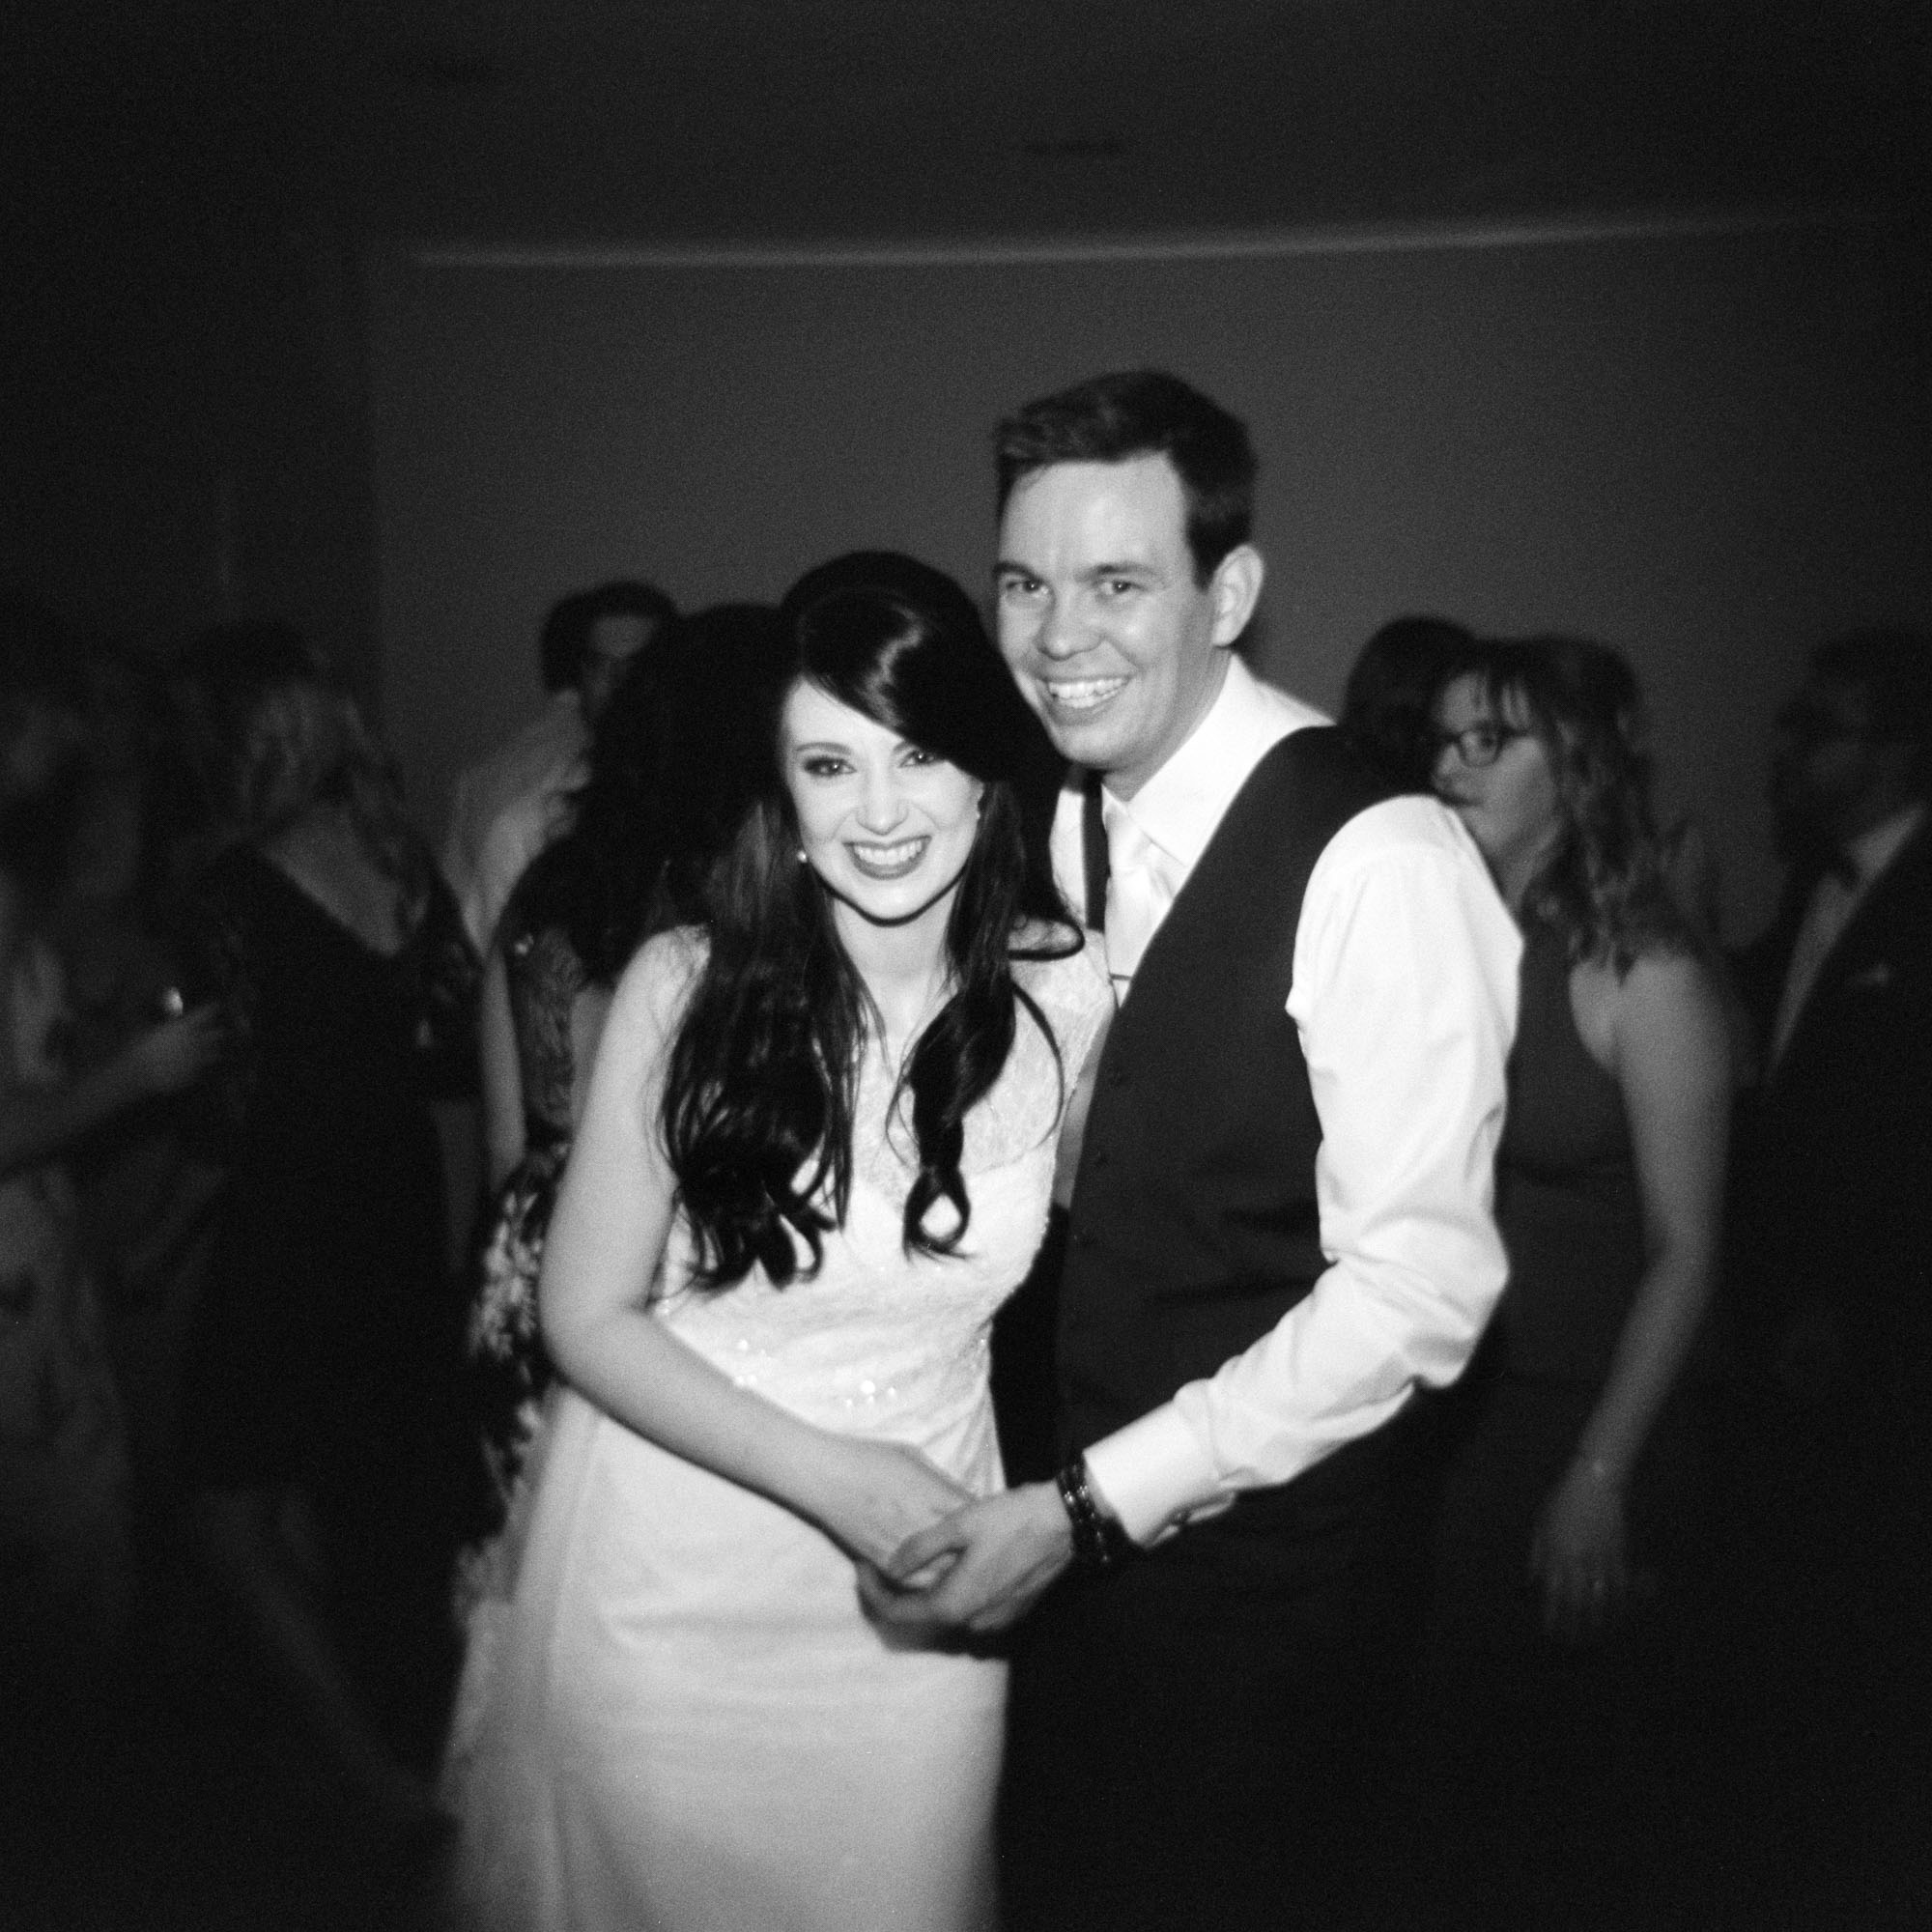 Glen-Ewin-Estate-wedding-photography-112.jpg